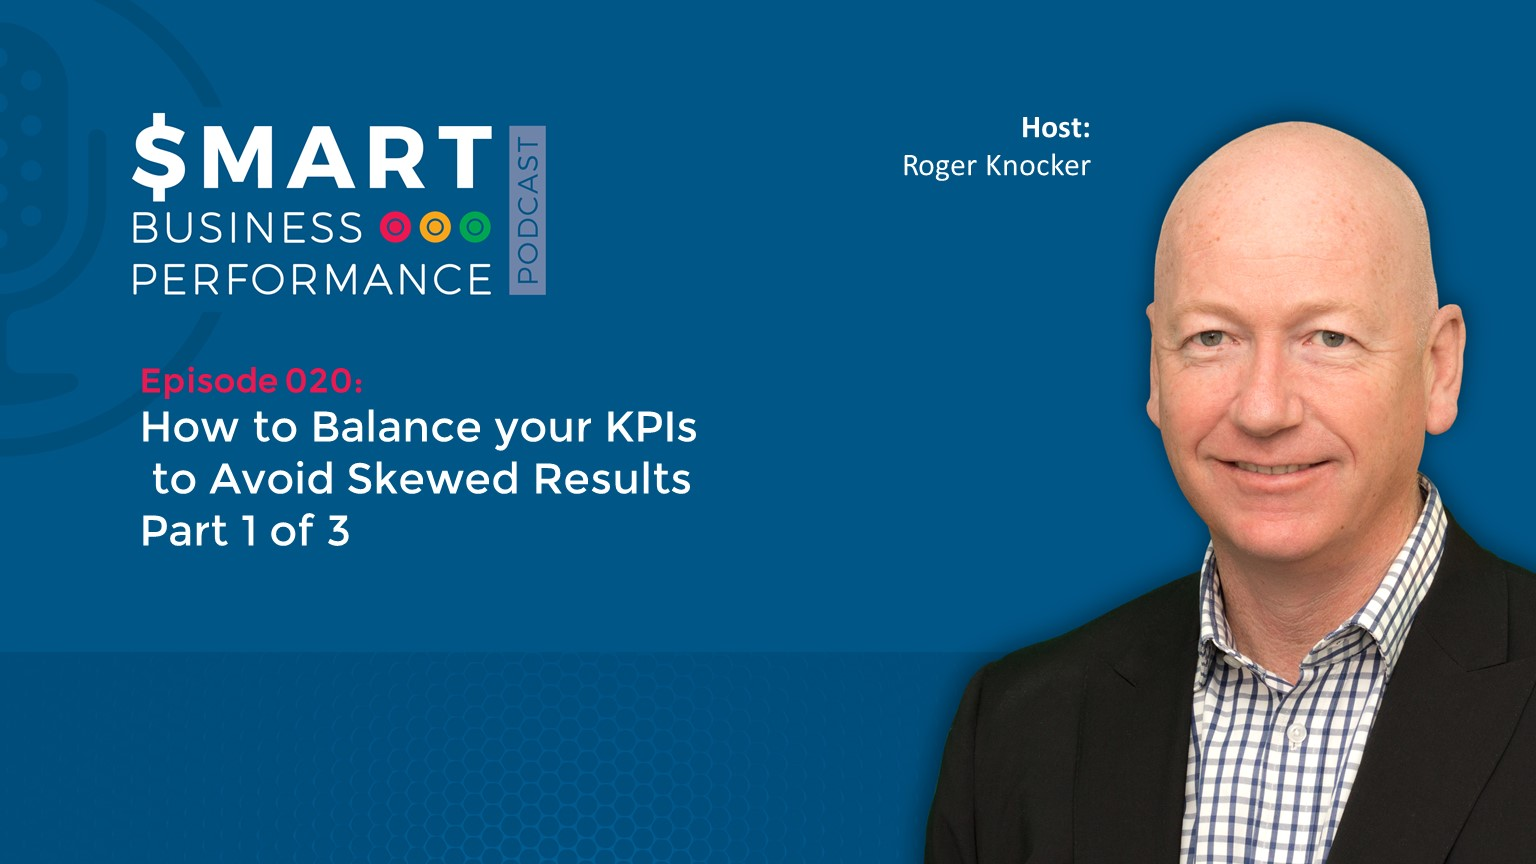 SBP020 How Balance your KPIs Part 1 of 3